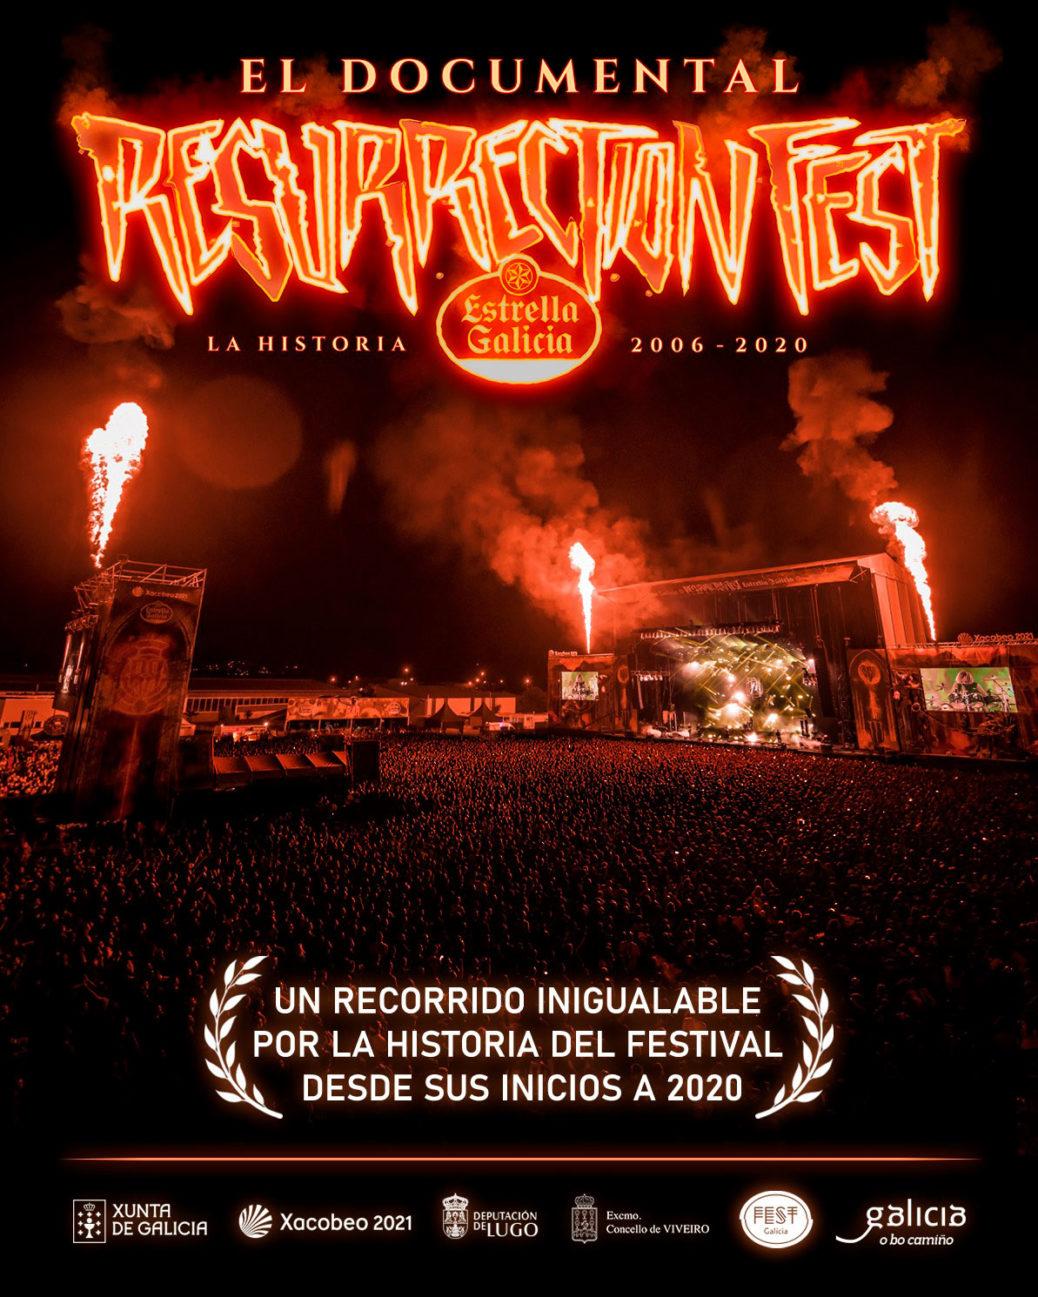 Documental Resurrection Fest La Historia